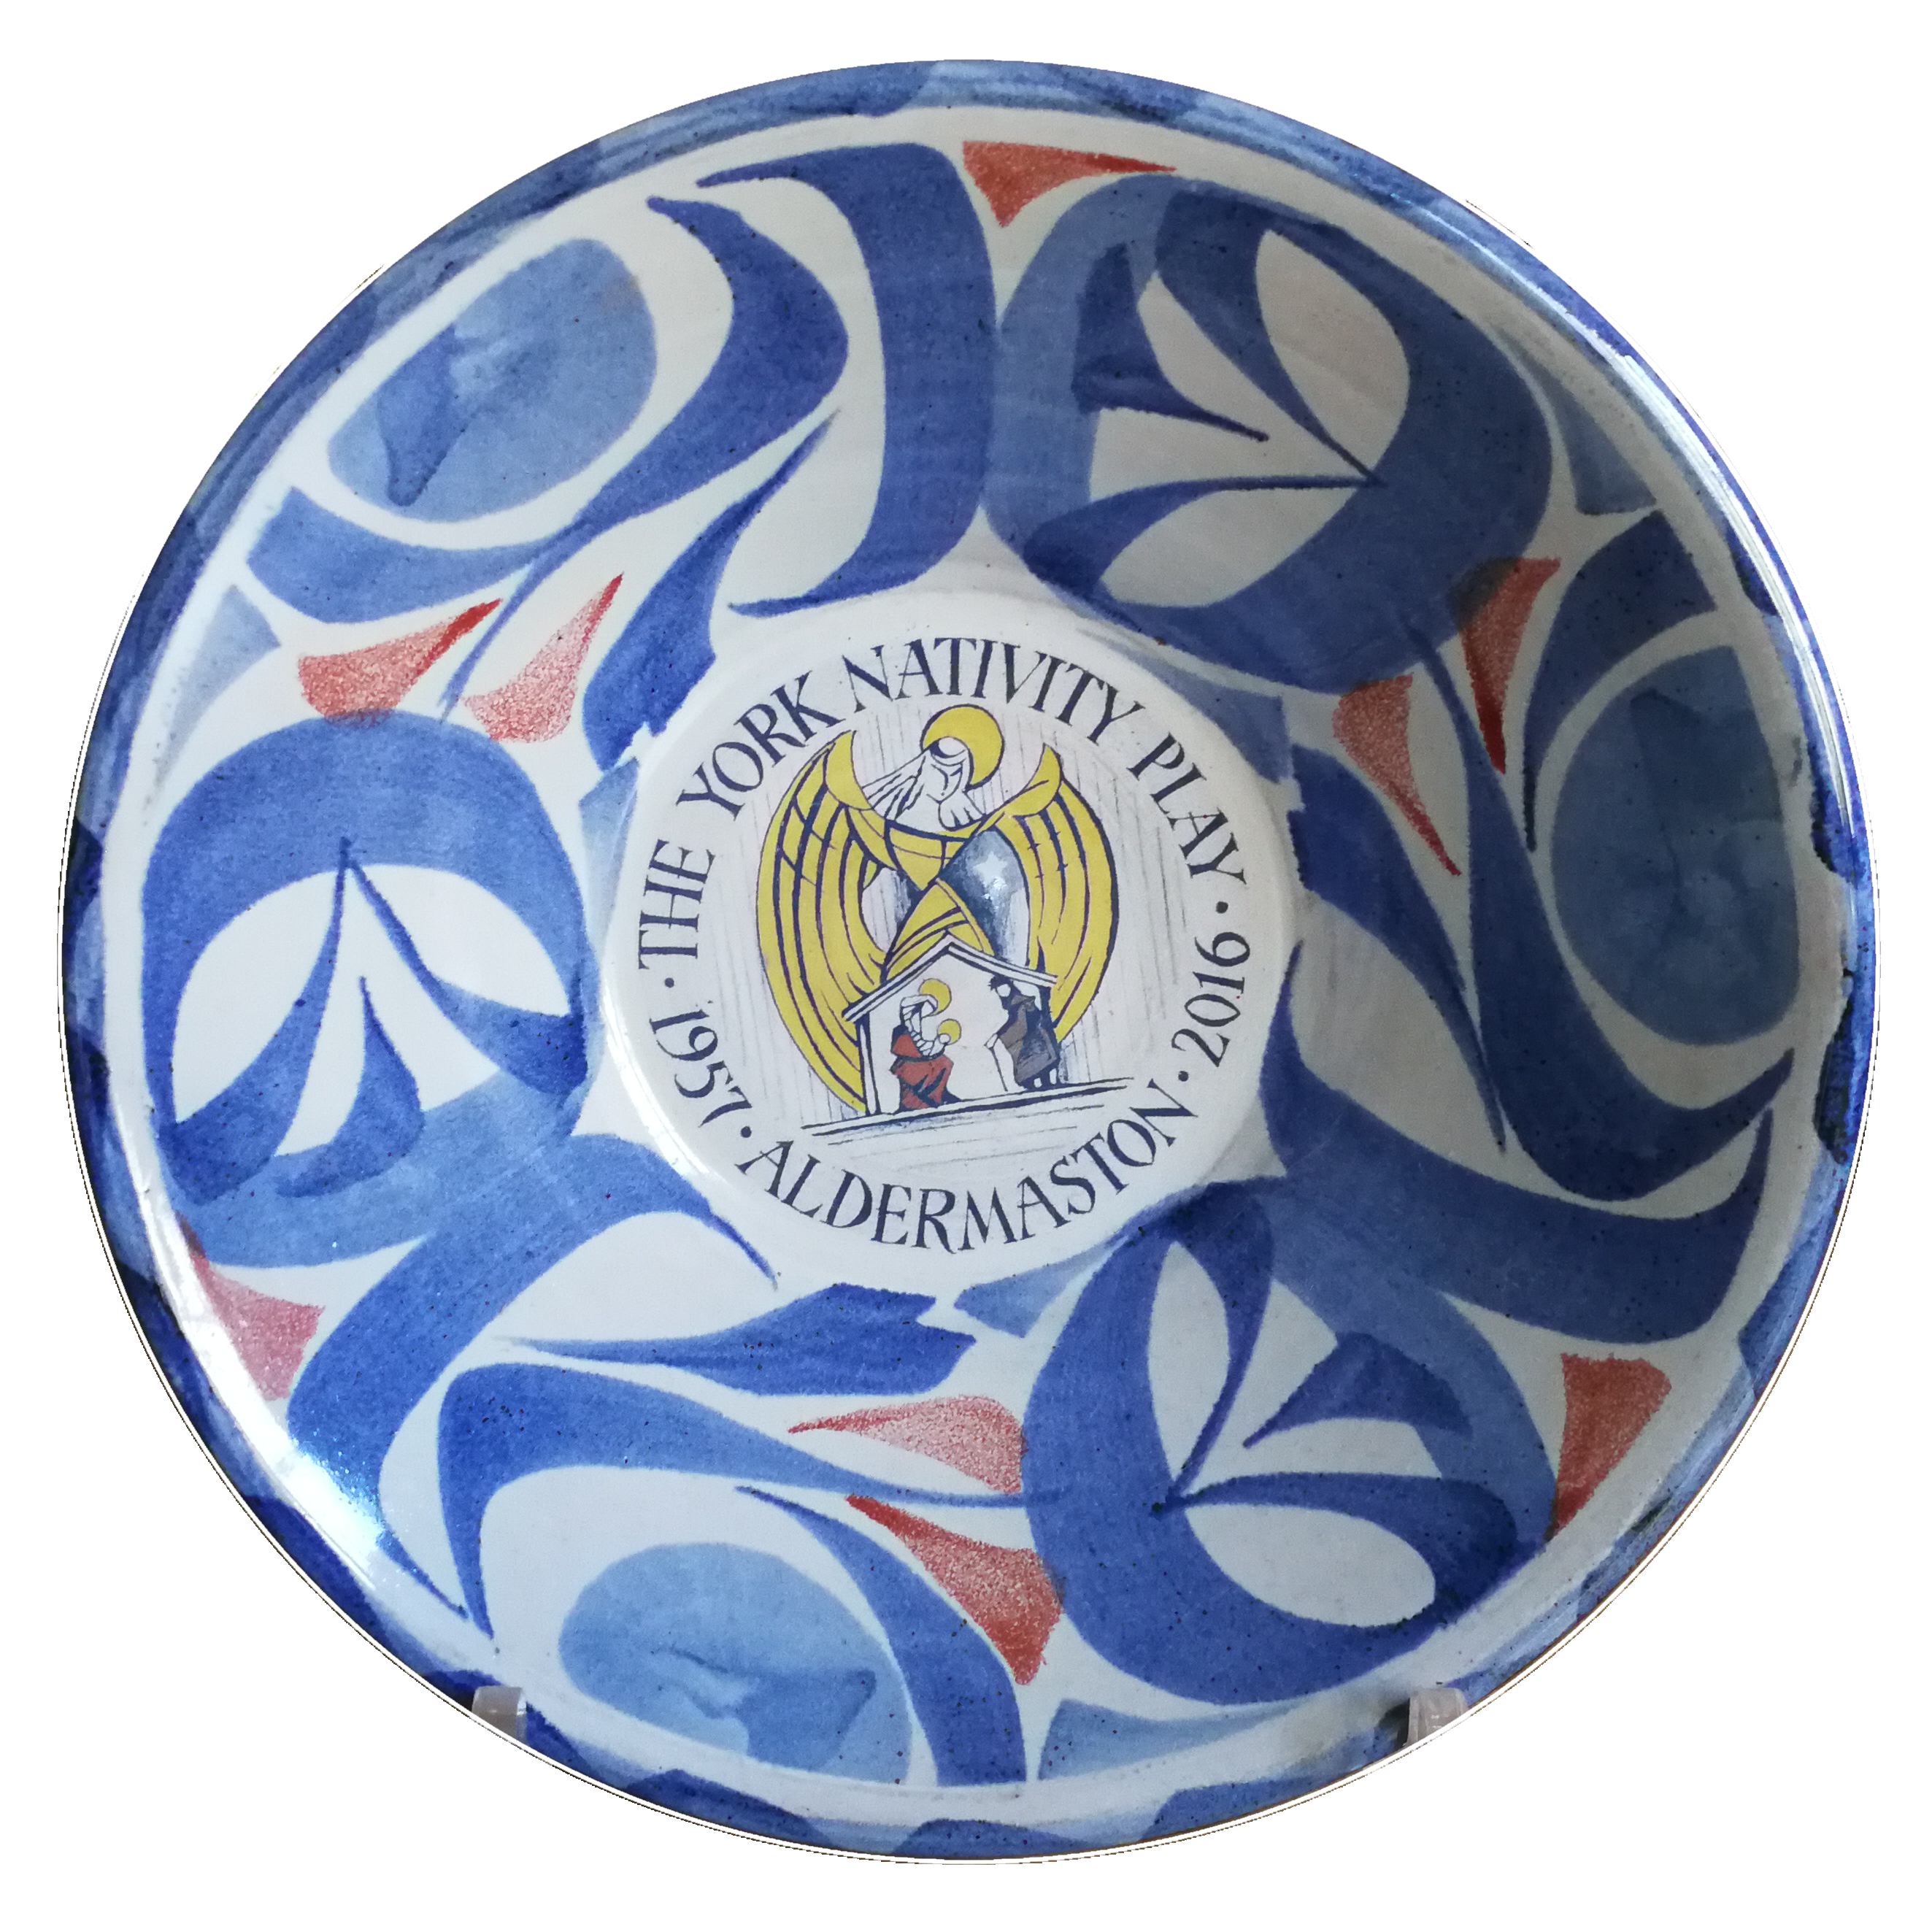 Commemorative bowl for 60th Anniversary in 2016